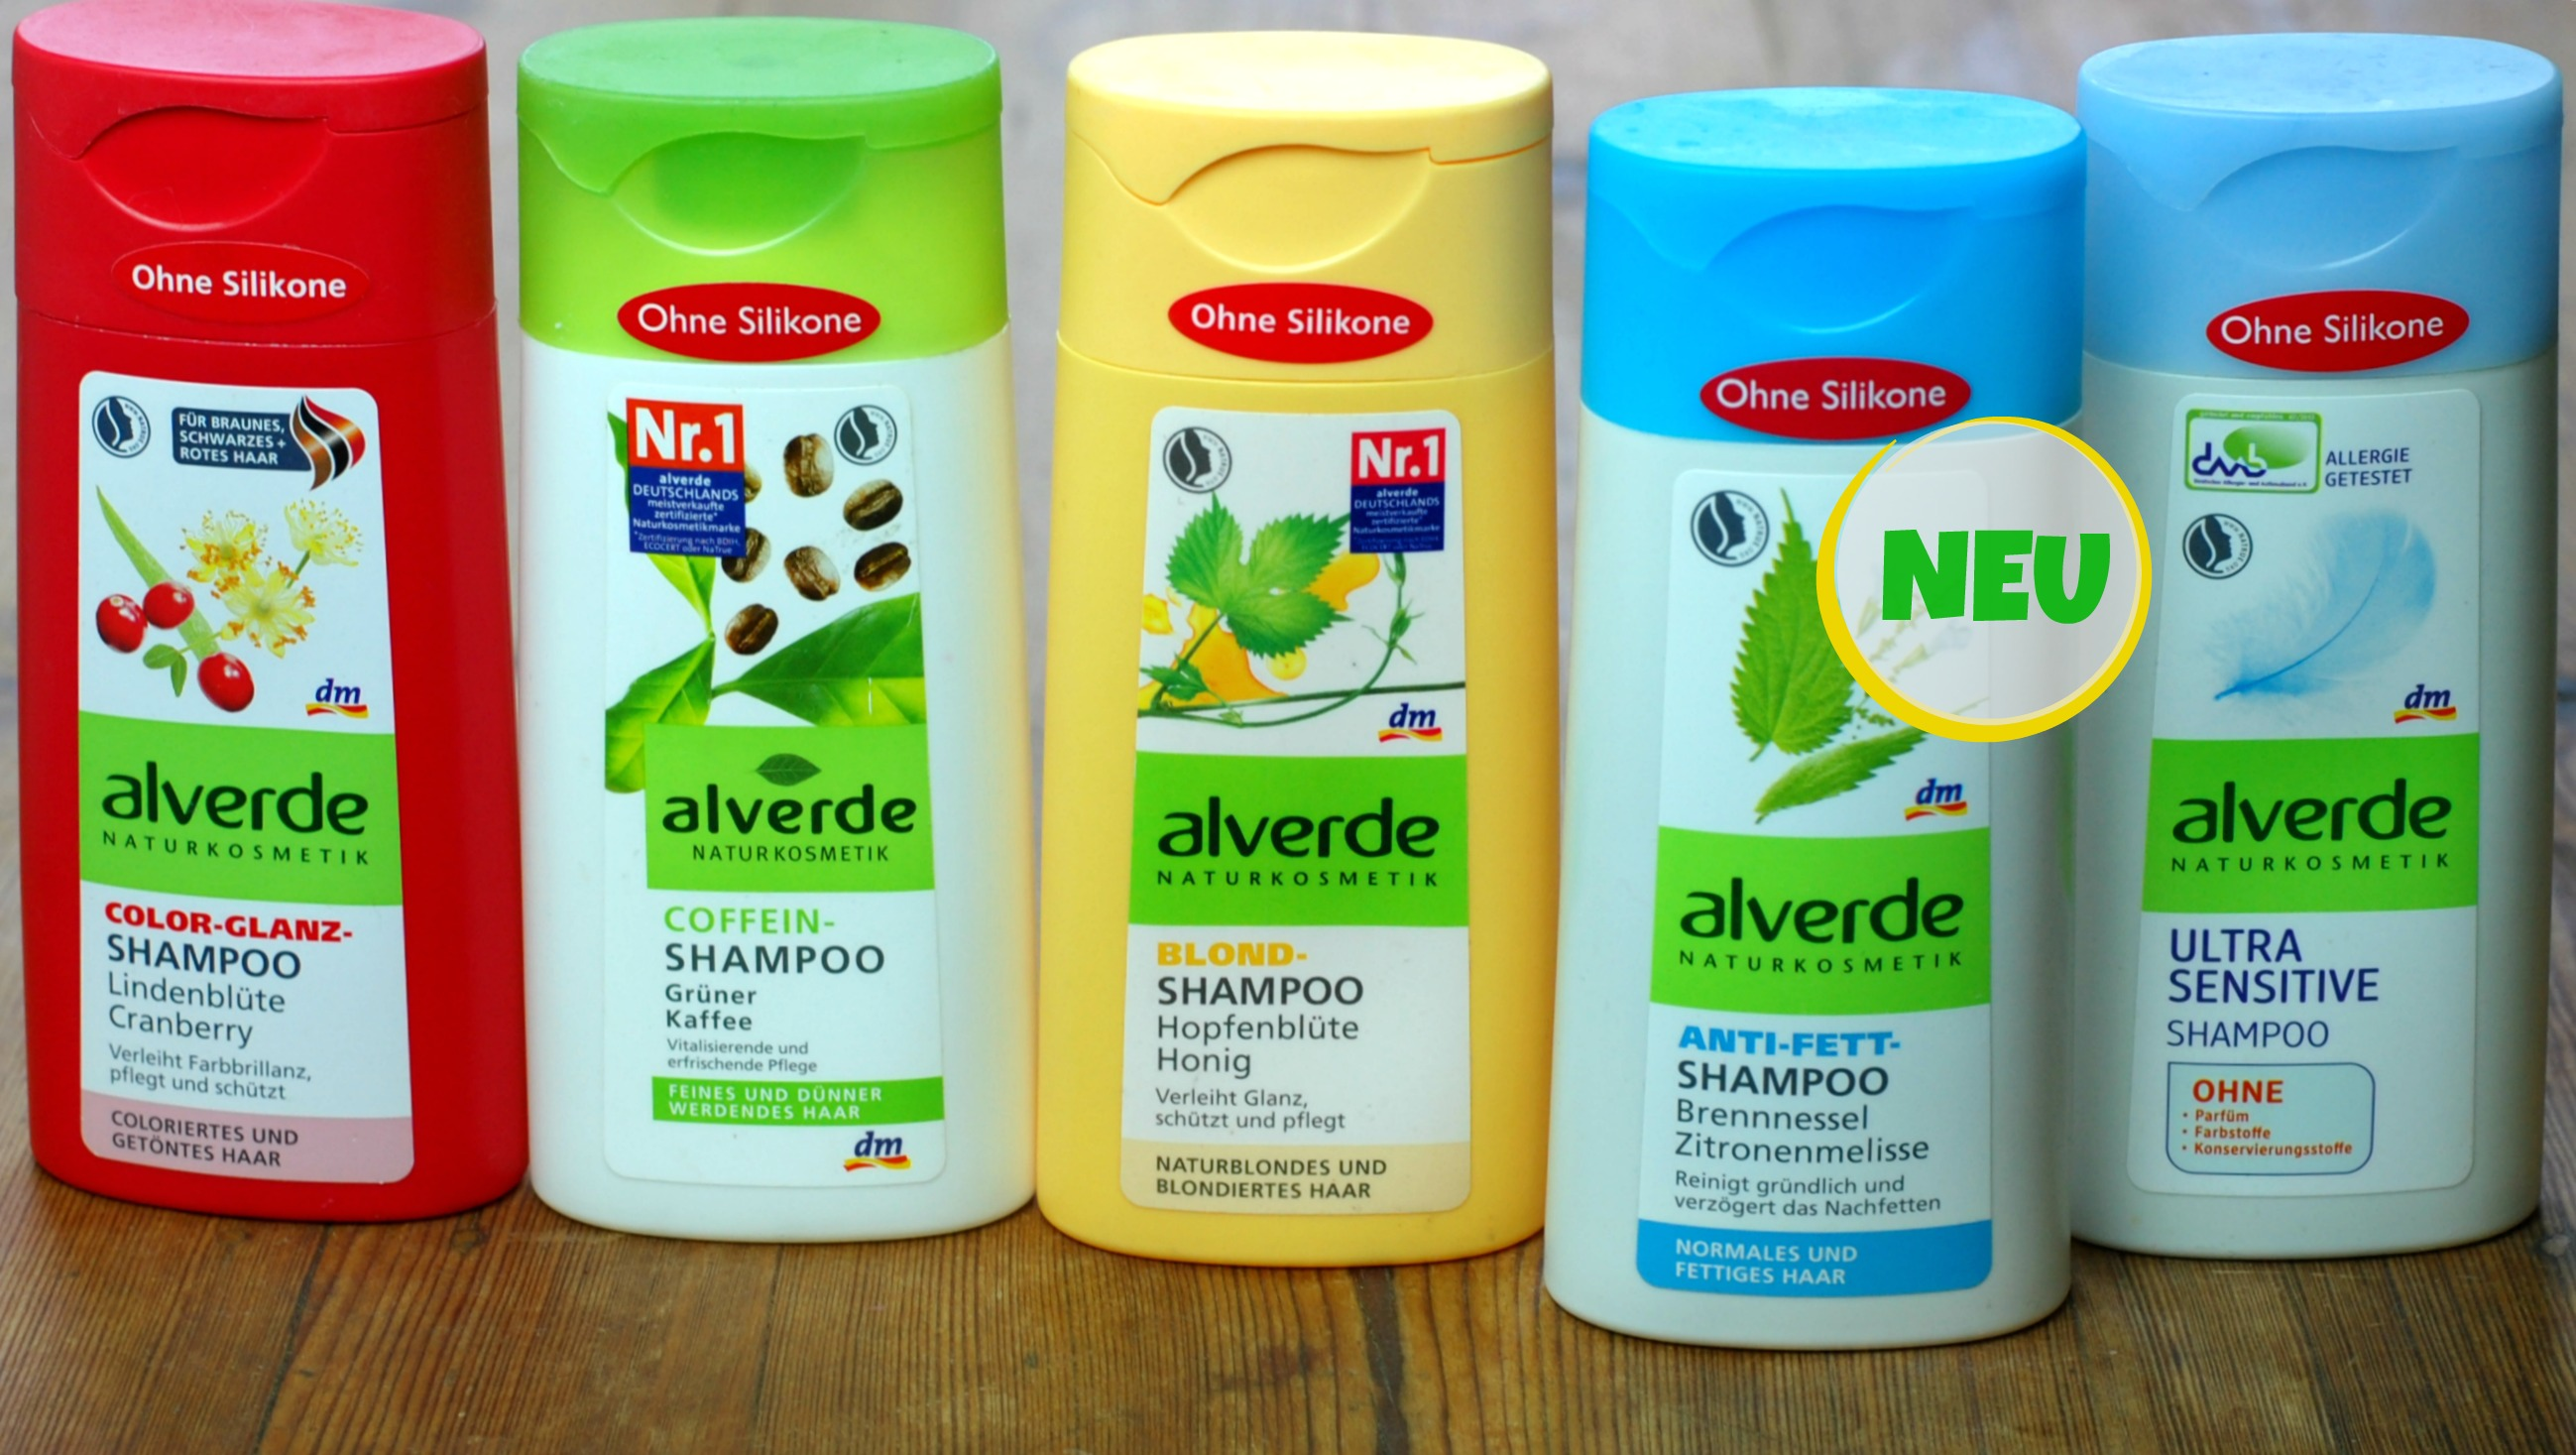 shampoo anti fett